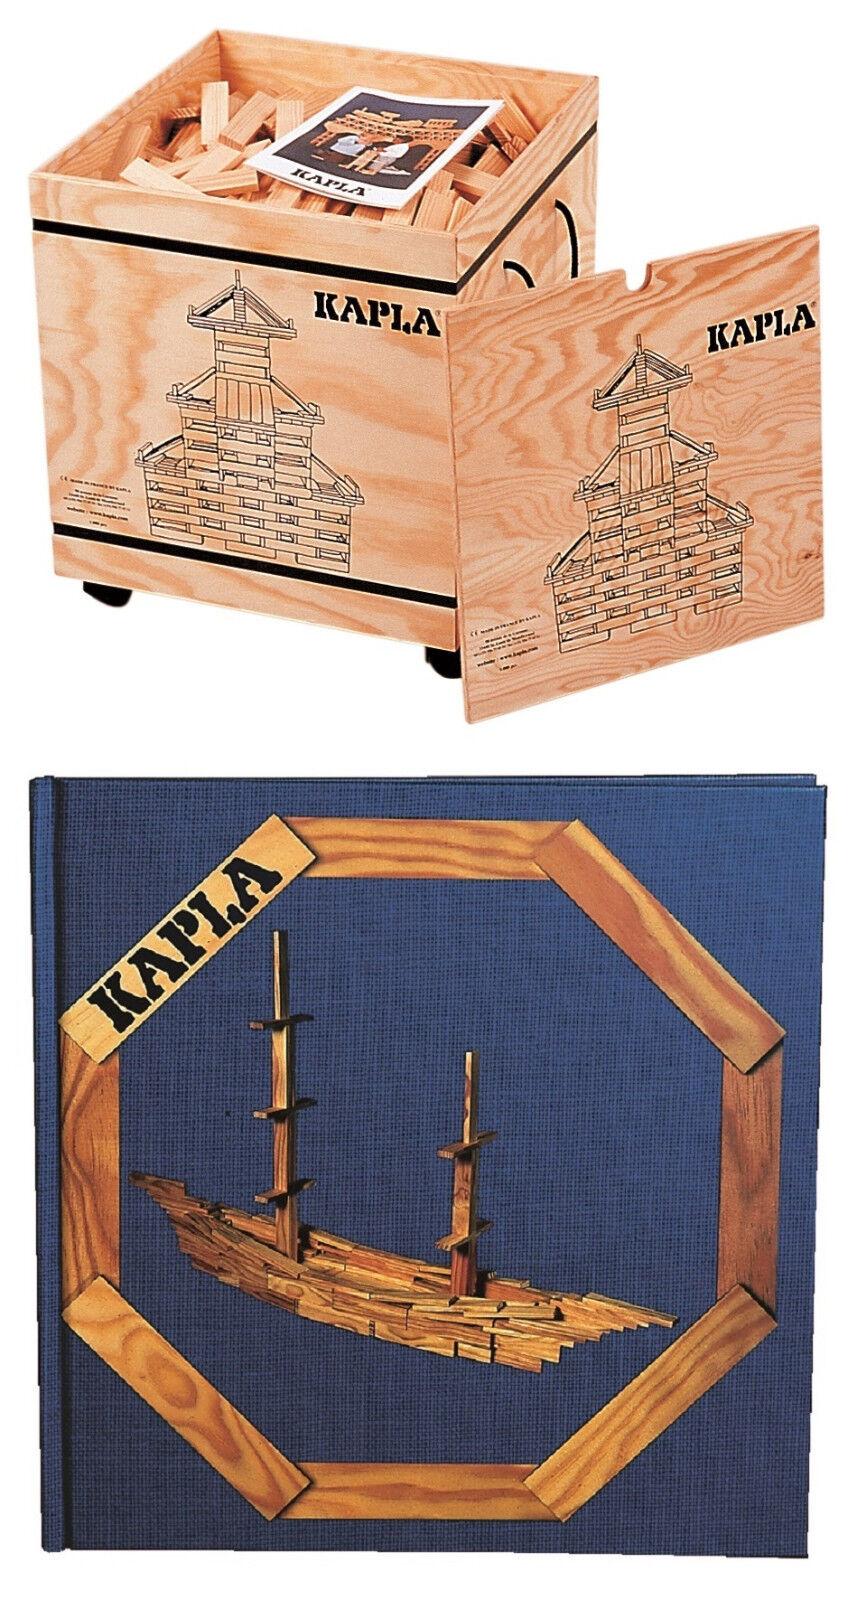 KAPLA 1000er Box Holzbausteine mit Kunstbuch Nr. 2 blau